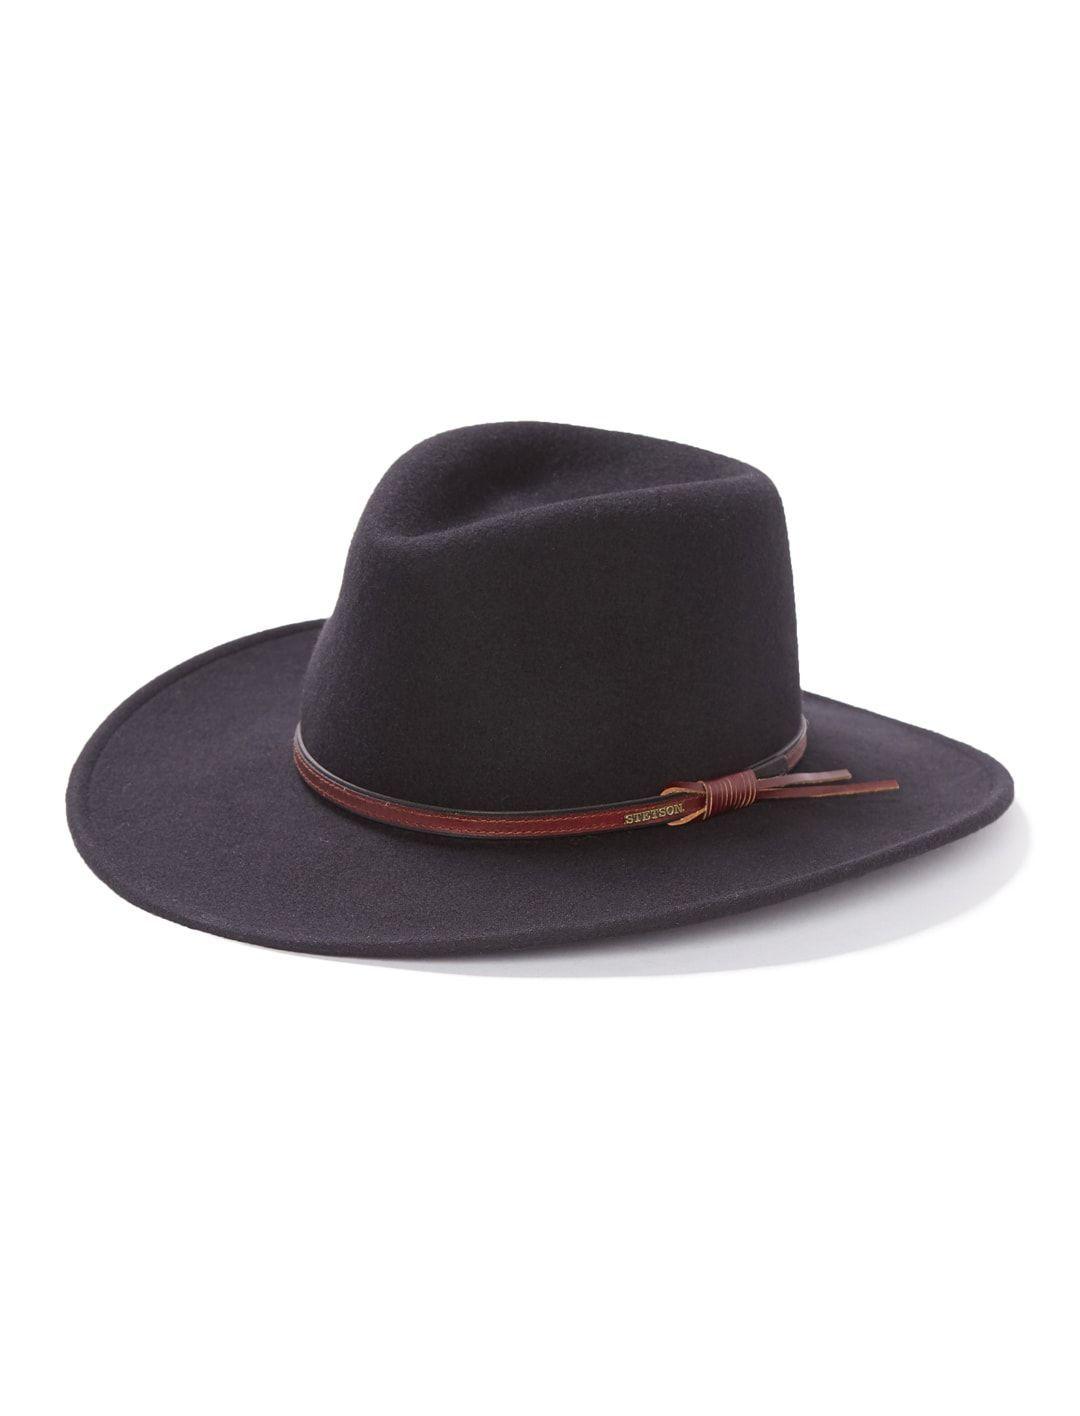 3fd3de27e2acff Bozeman Outdoor Hat, size L | Xmas List | Outdoor hats, Hats, Hats ...